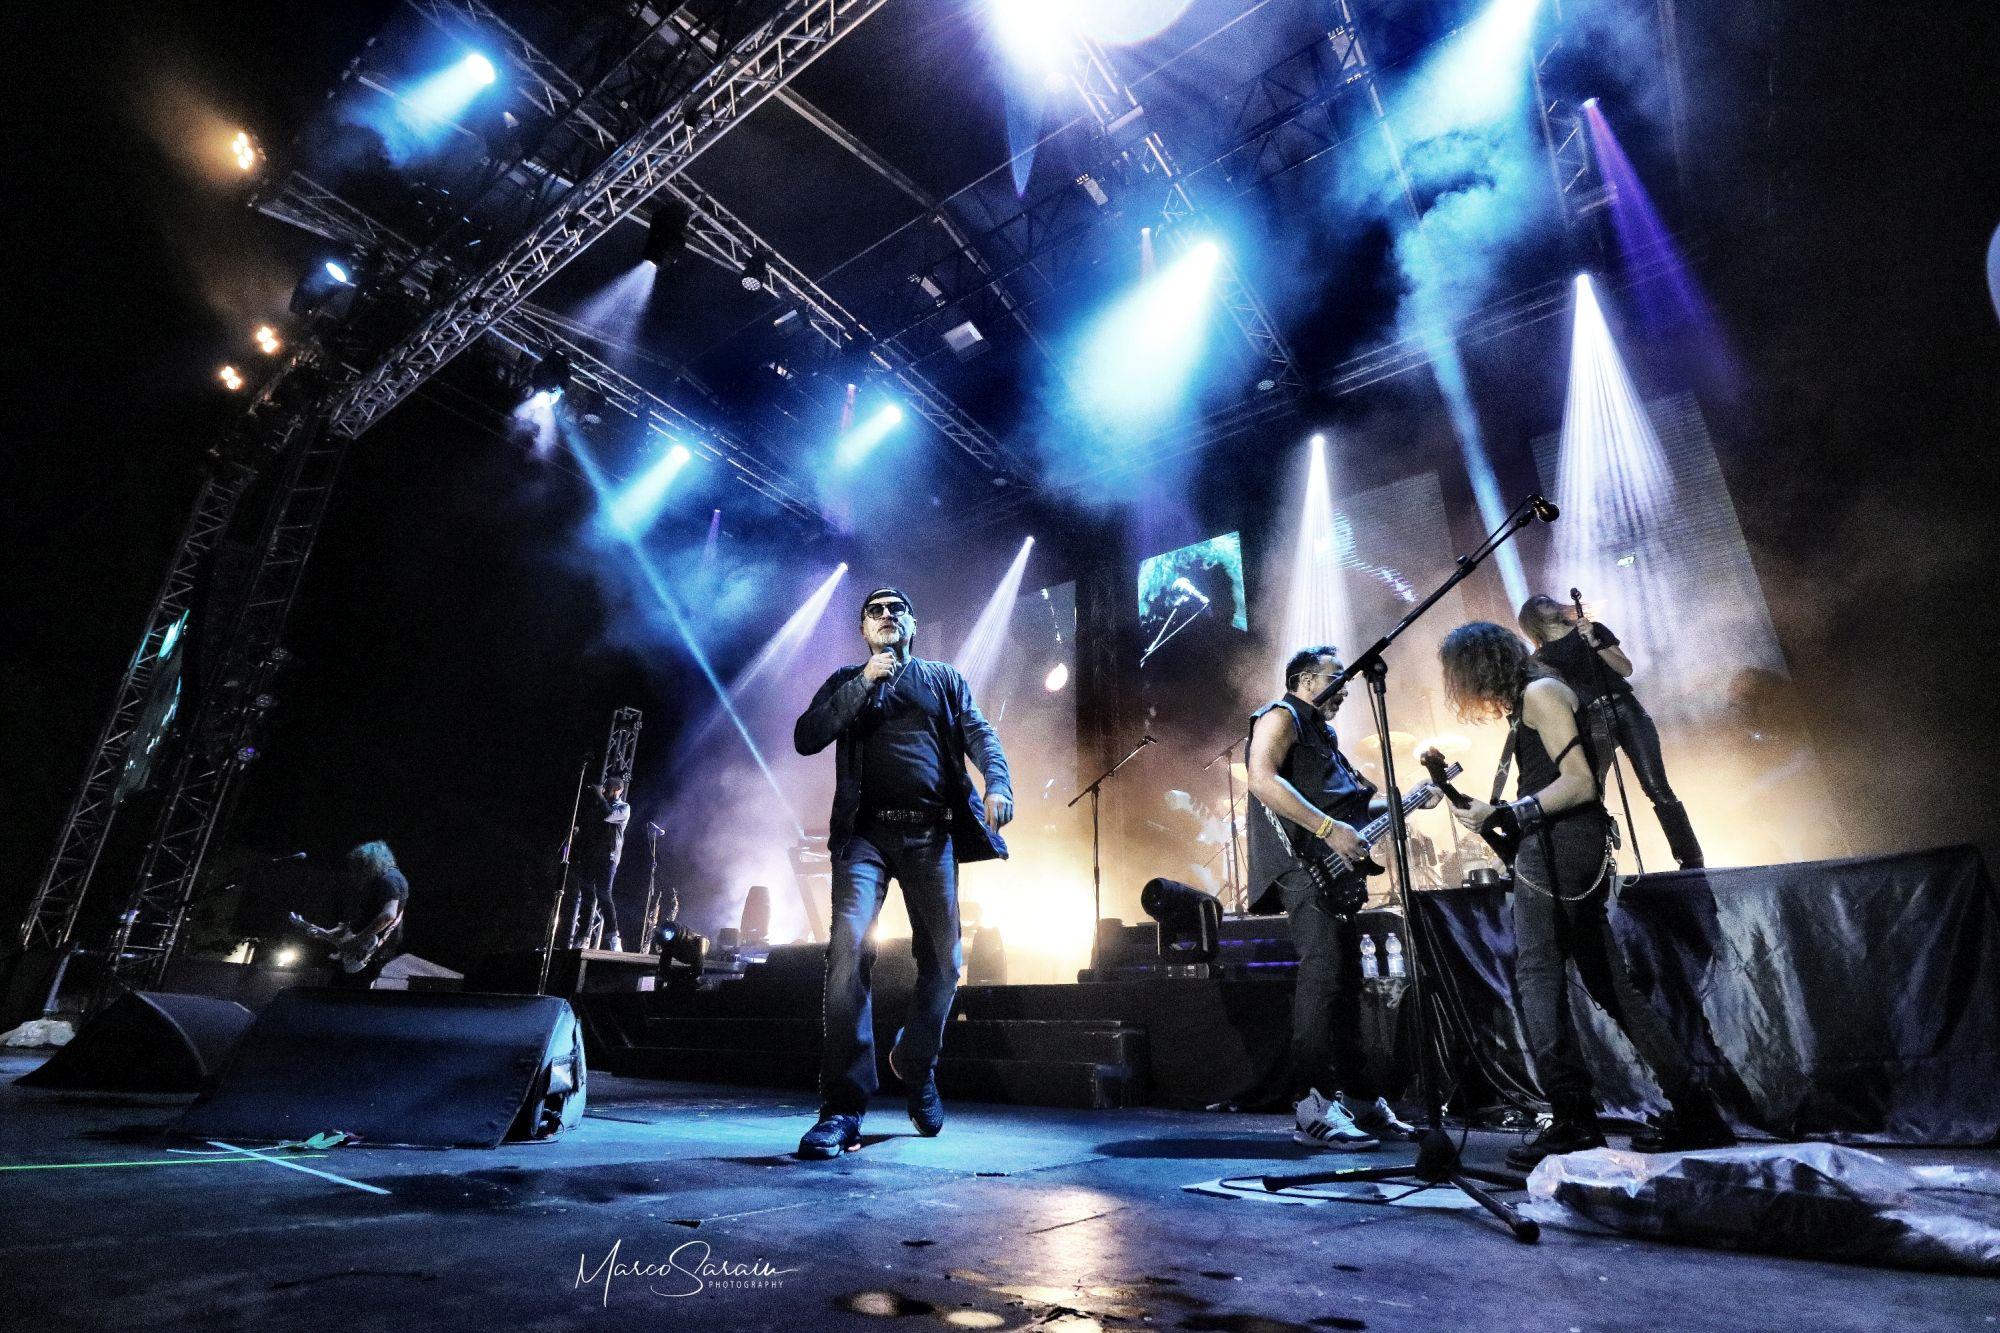 Diapasonband Live - Borgo Santa Croce (VERONA) 2019